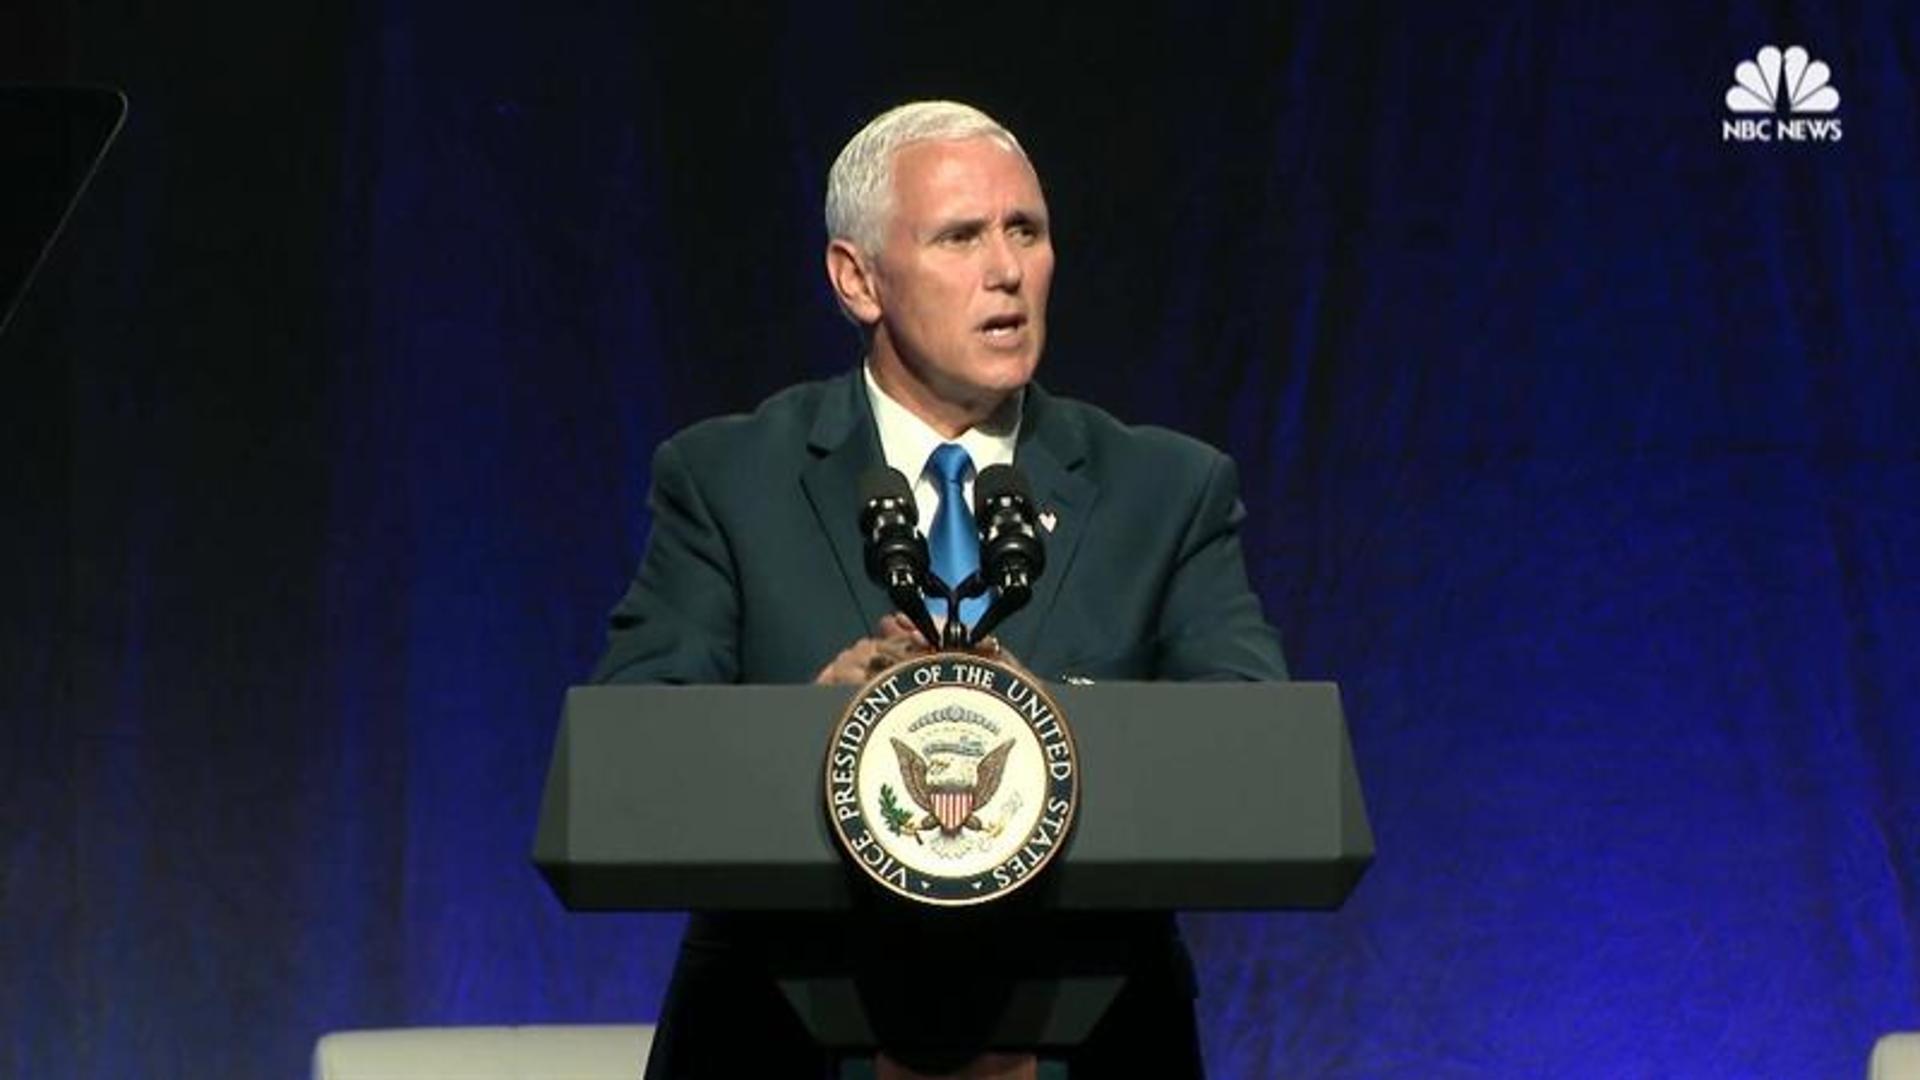 Ohio Pushes Back Against Mike Pence's 'False' Health Care Claims